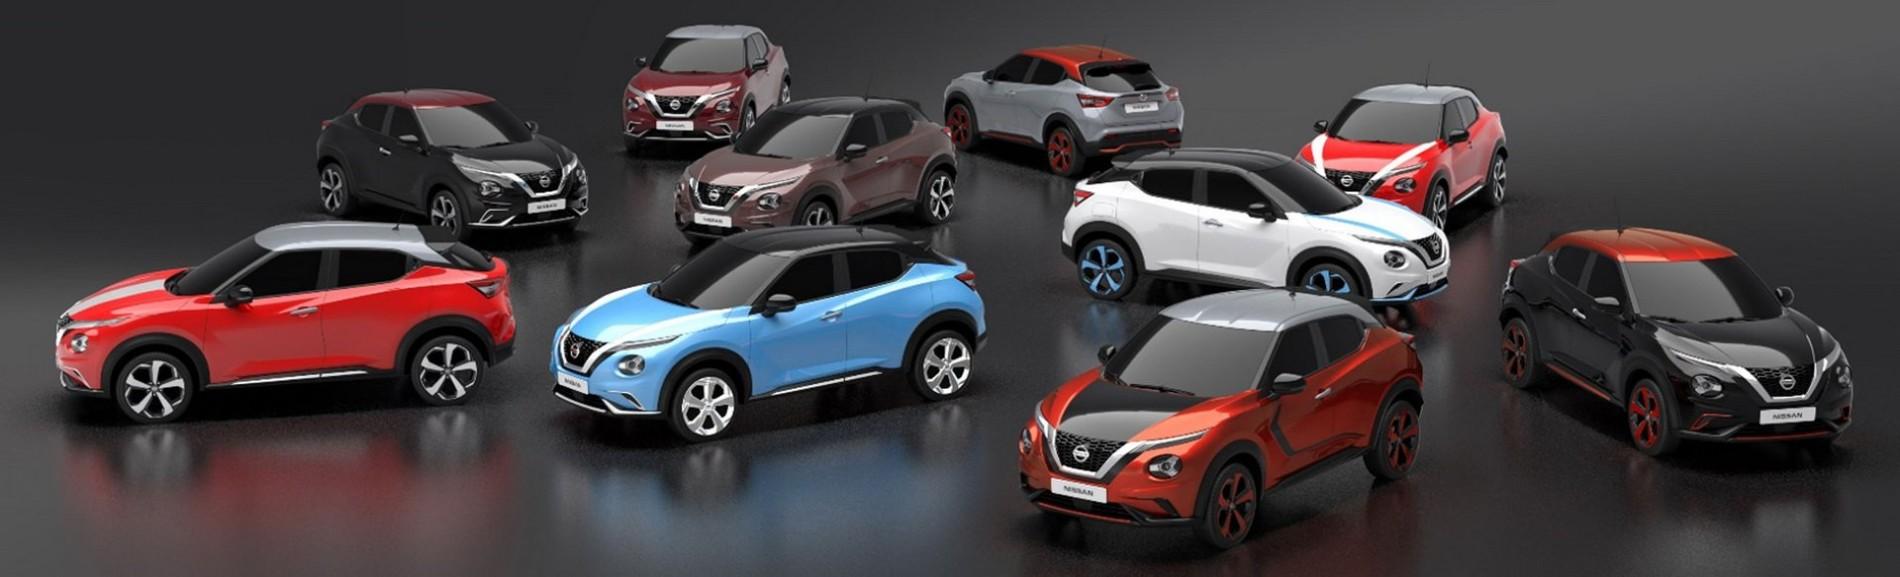 Nissan Juke - Galerie Foto - Nissan Juke - Galerie Foto